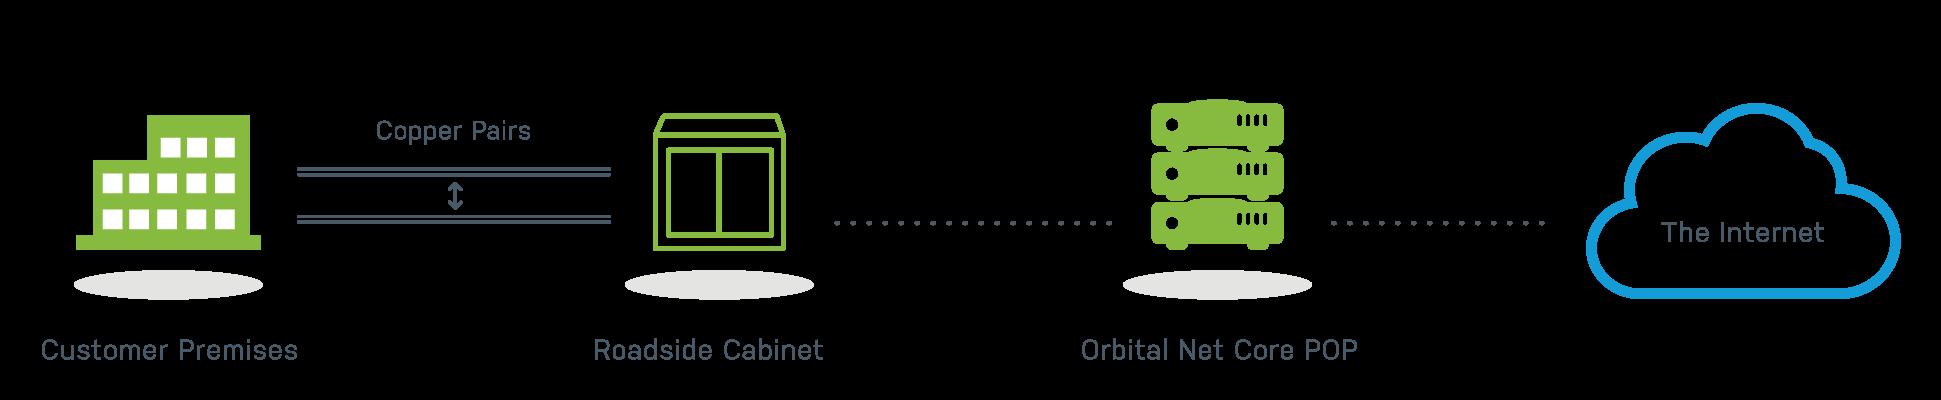 Orbital Net